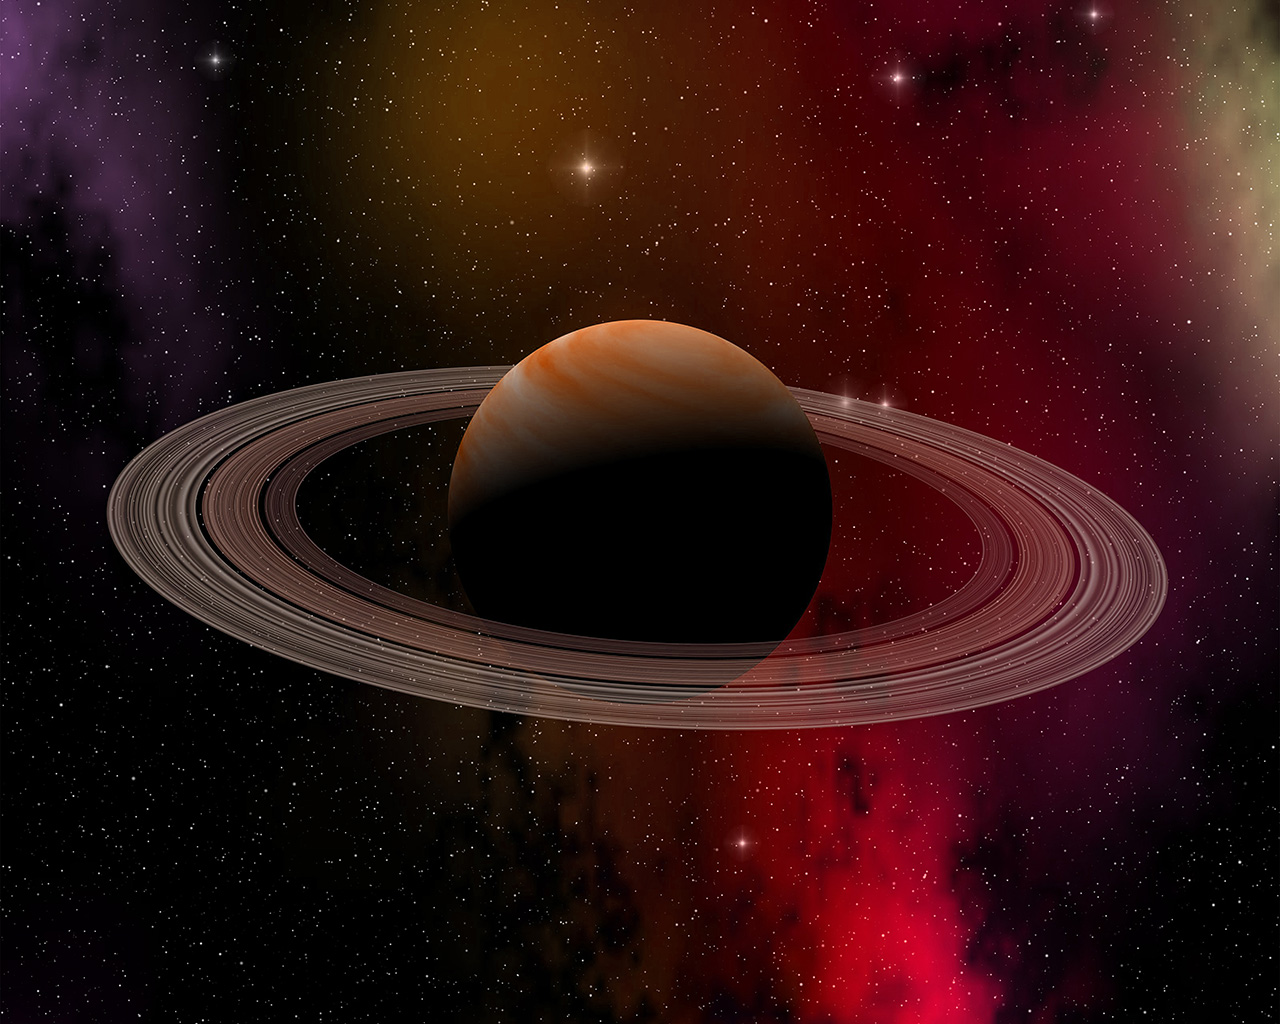 Spring Desktop Wallpaper Hd At79 Space Planet Saturn Star Art Illustration Red Wallpaper